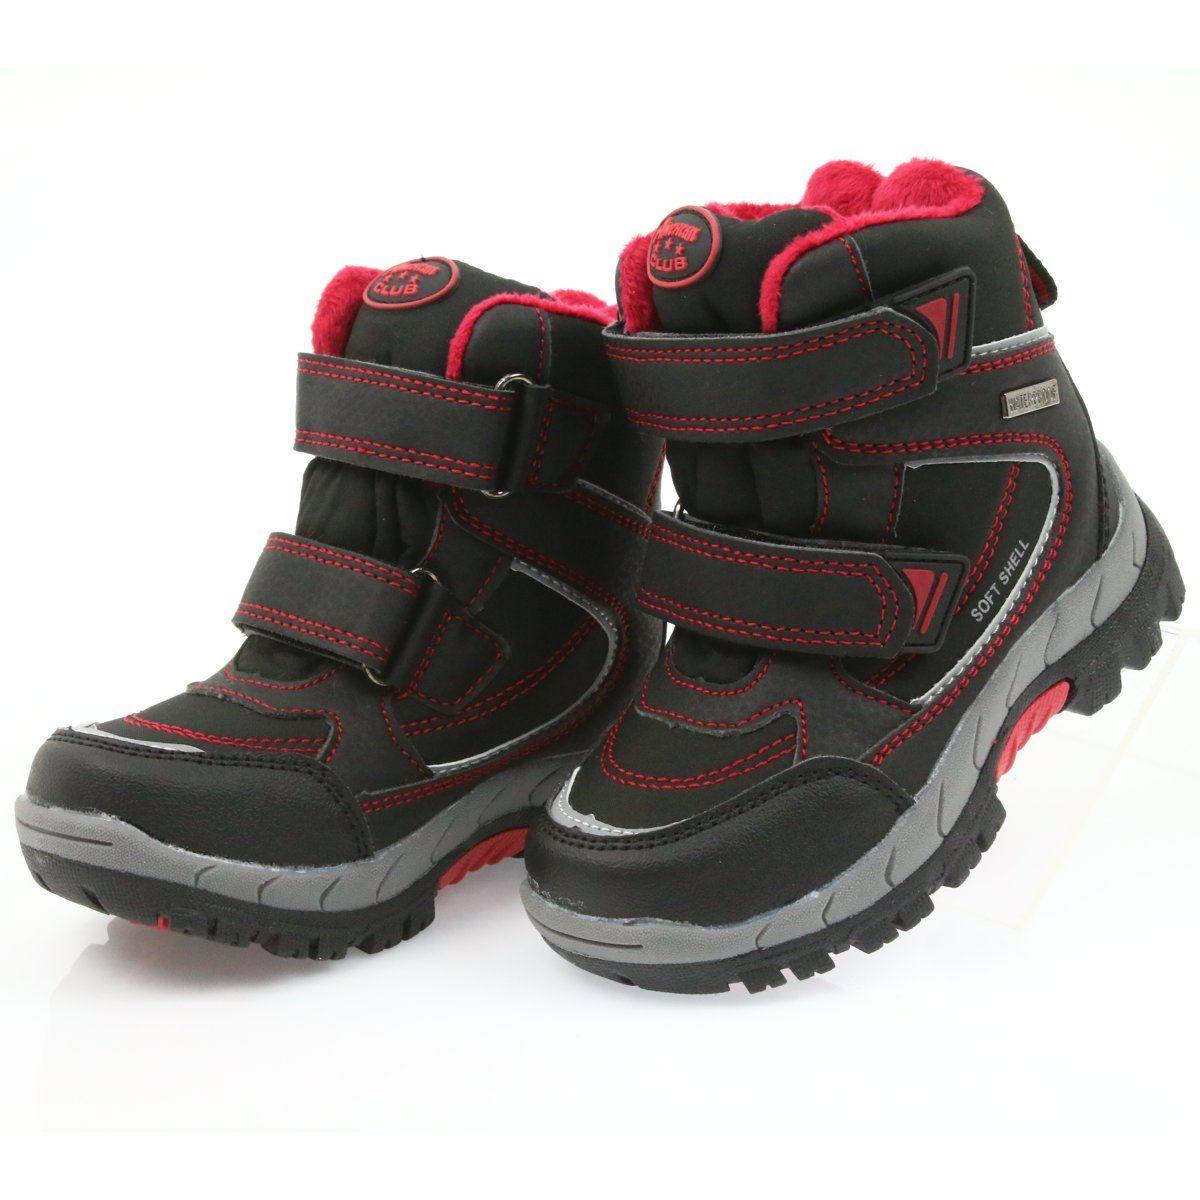 American Club American Kozaki Buty Zimowe Z Membrana 3122 Shoes Fisherman Sandal Sandals